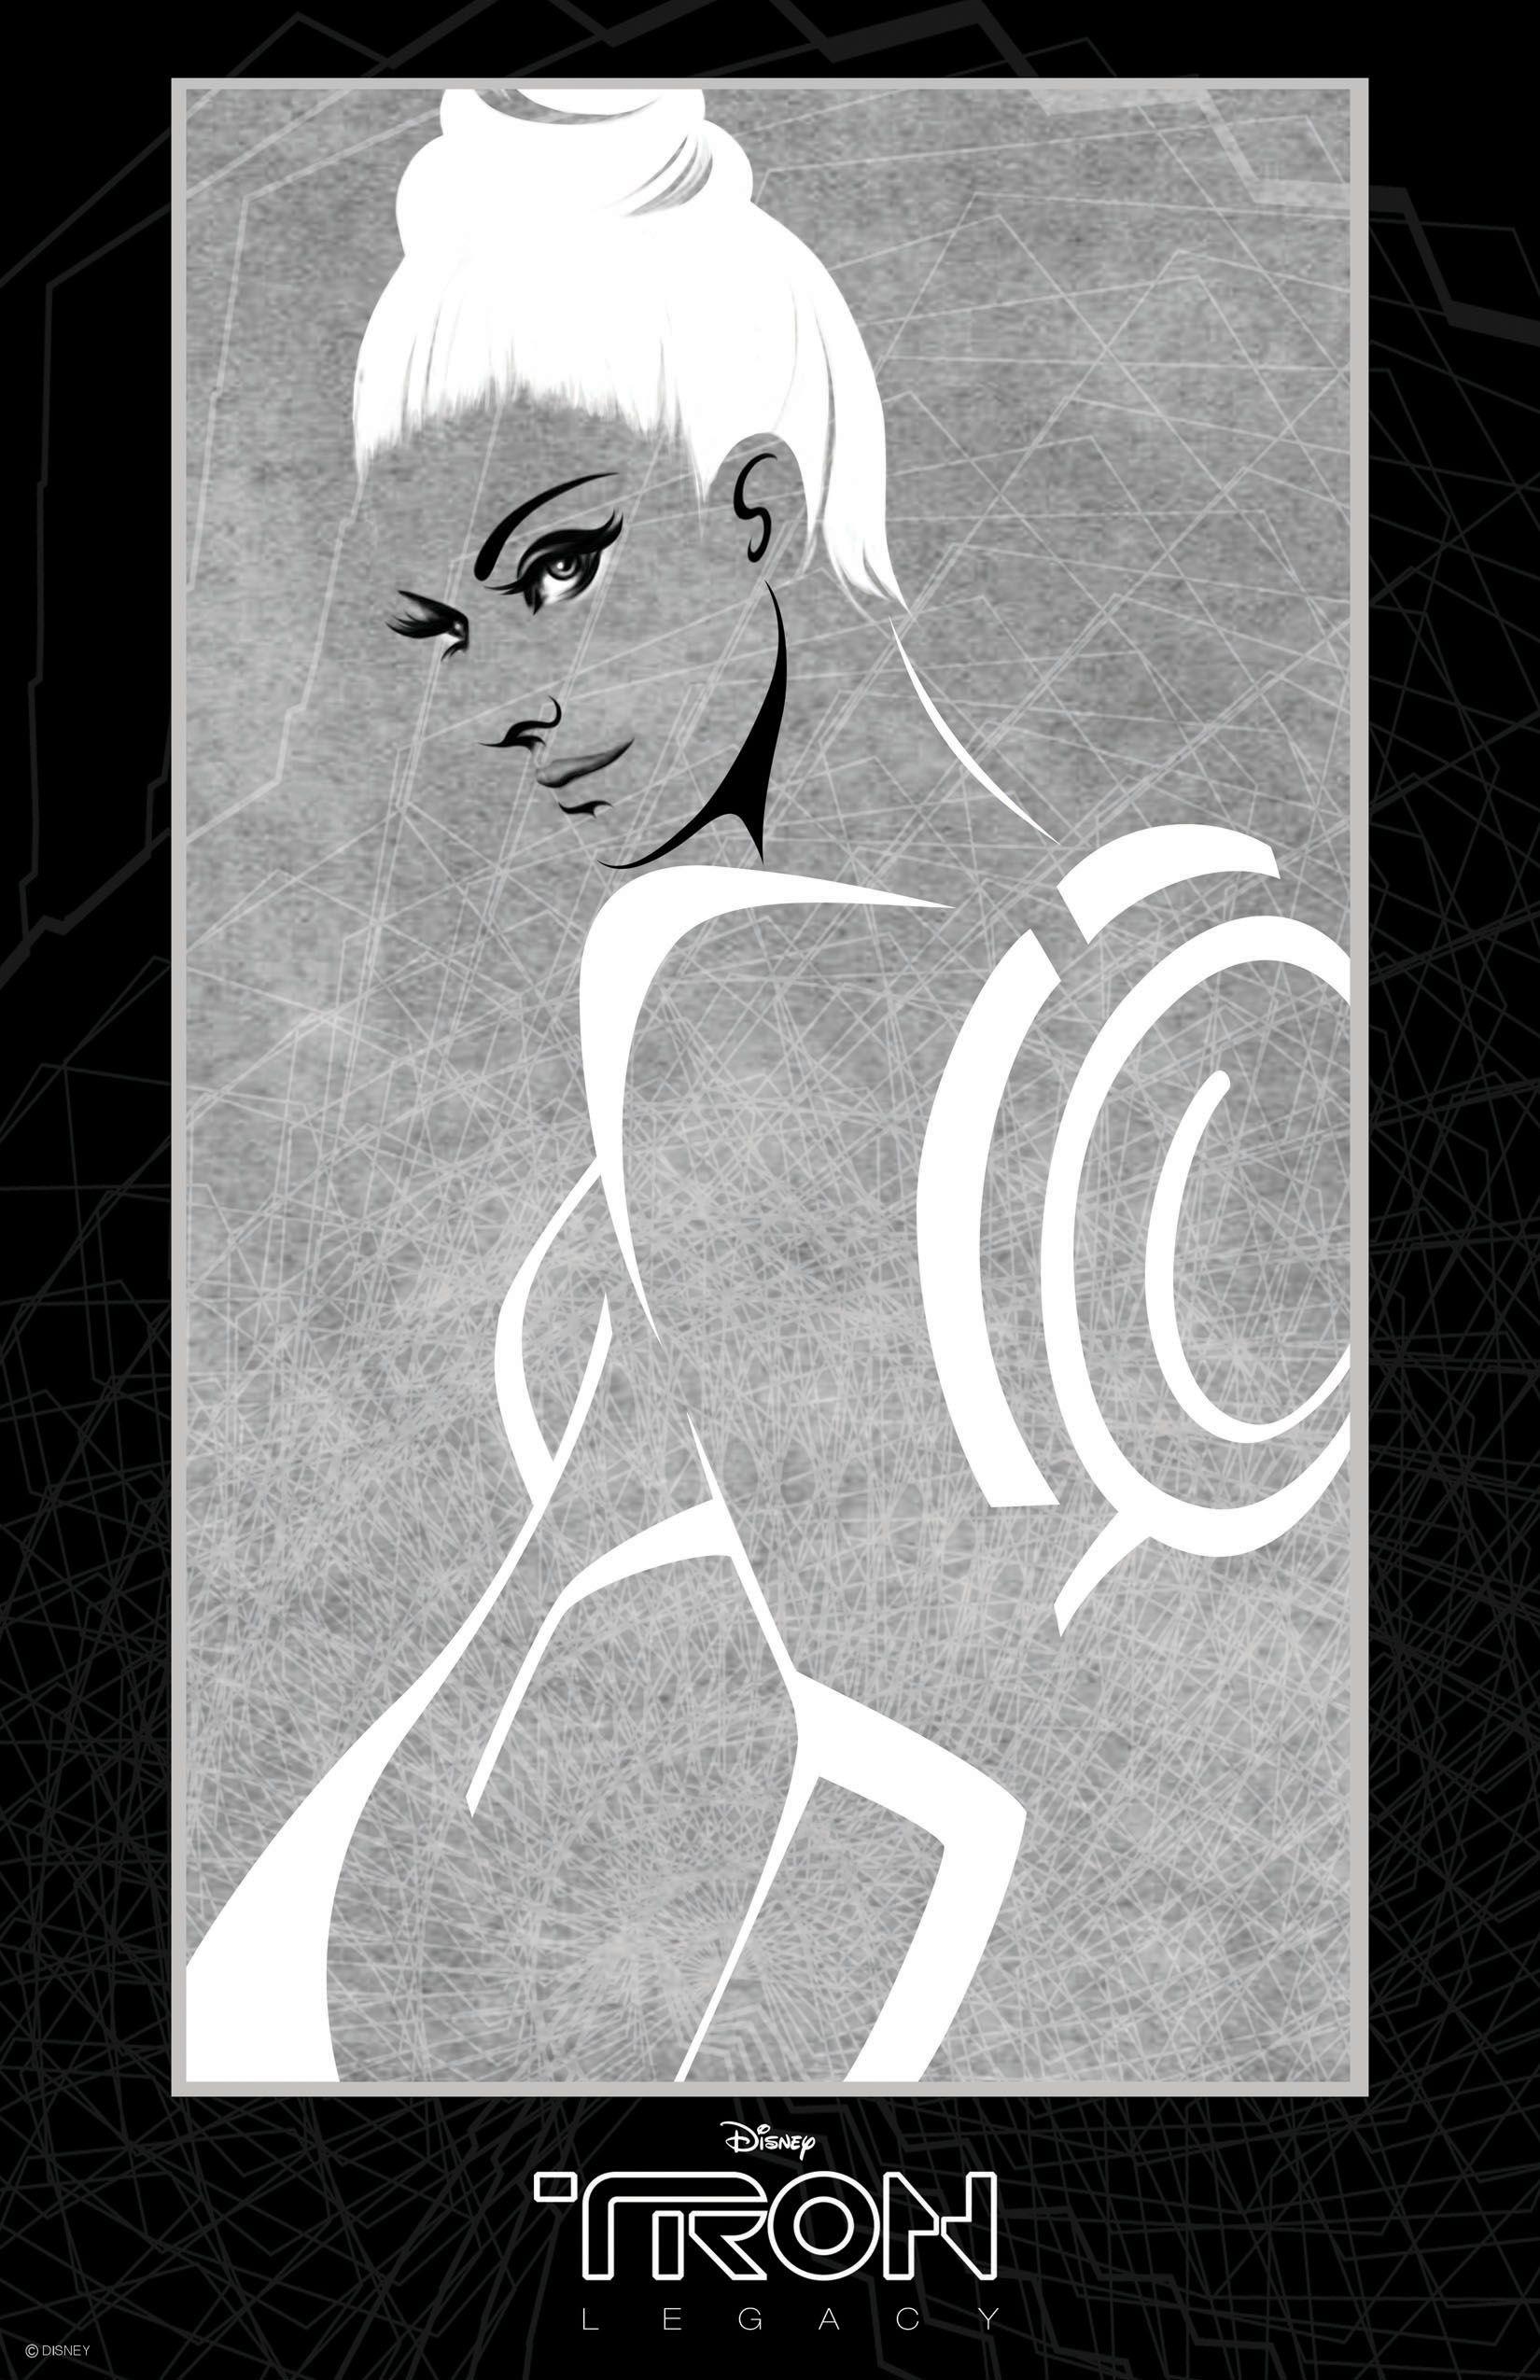 концепт-арты Трон: Наследие